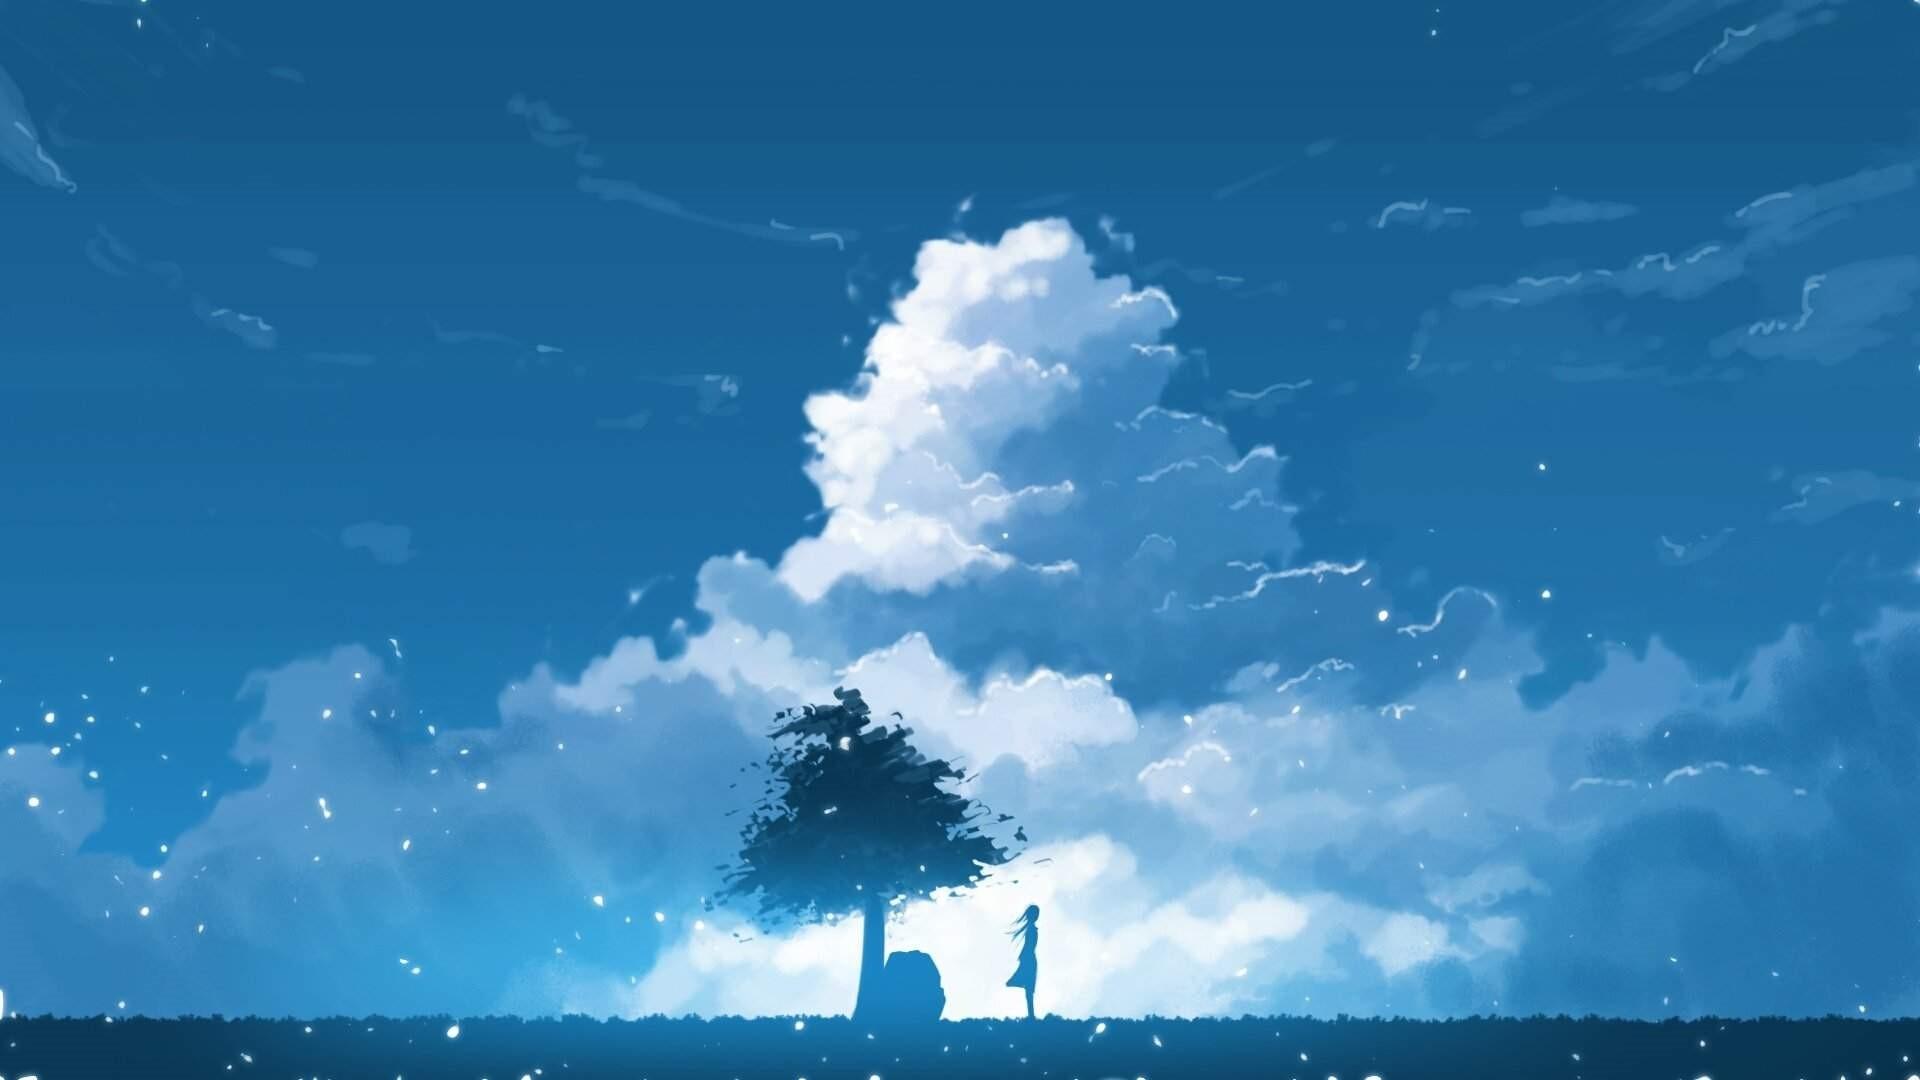 Anime Clouds HD Wallpaper